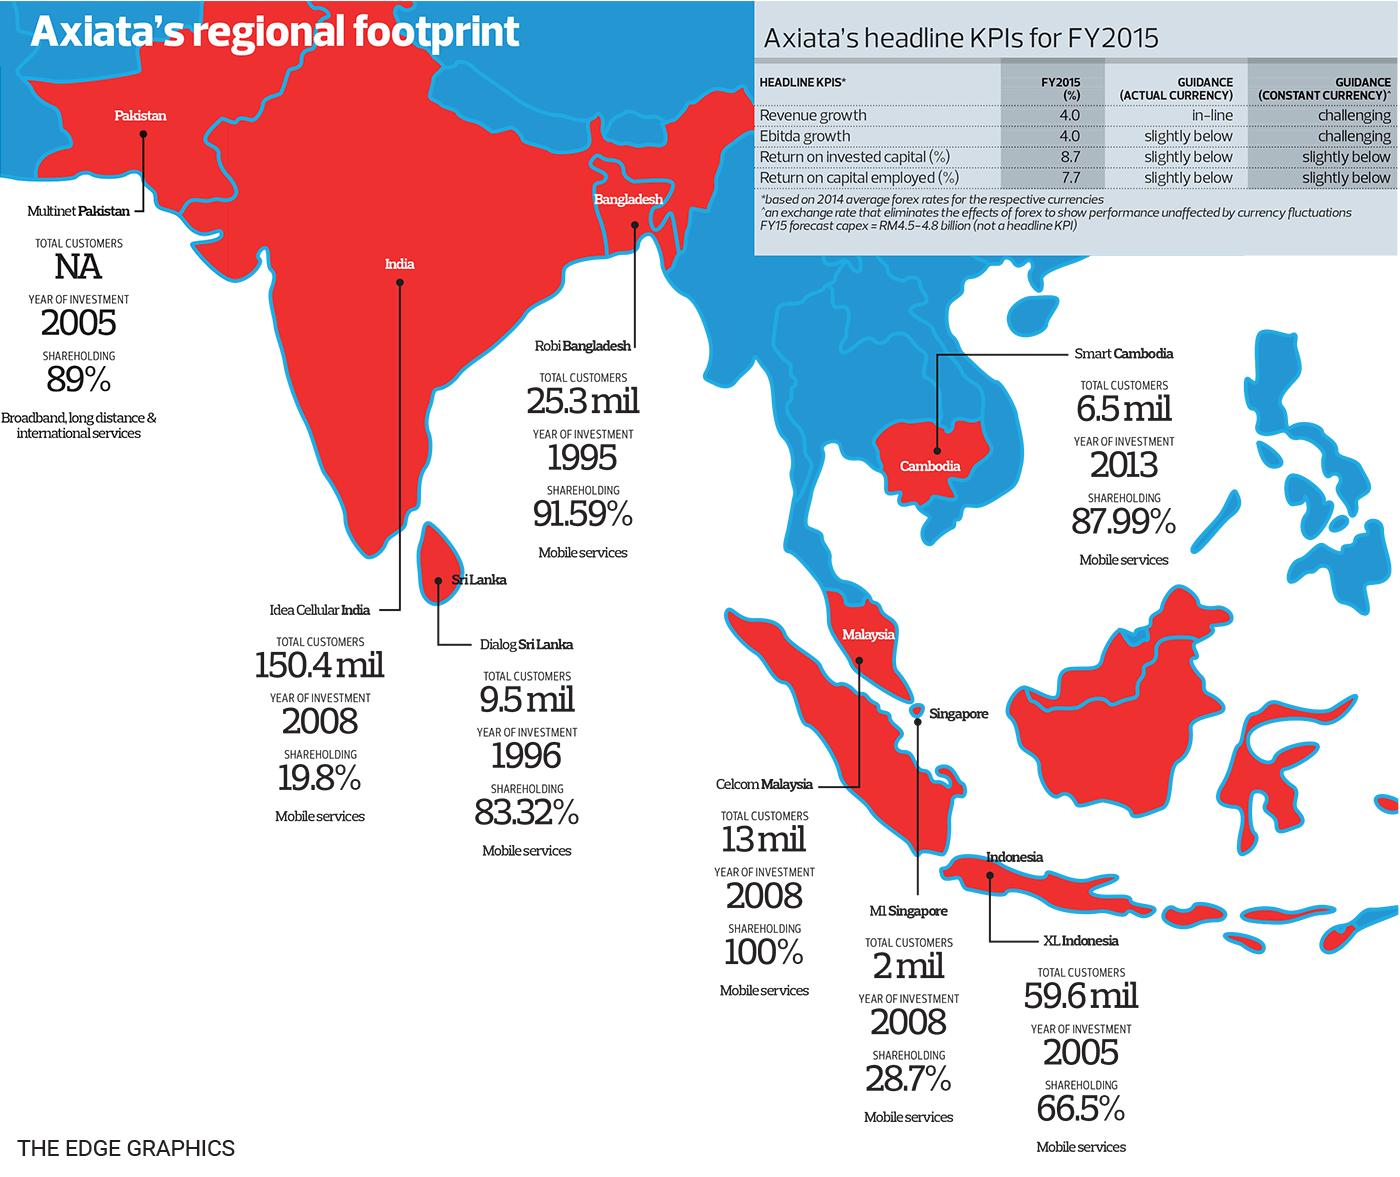 Axiata's regional footprint